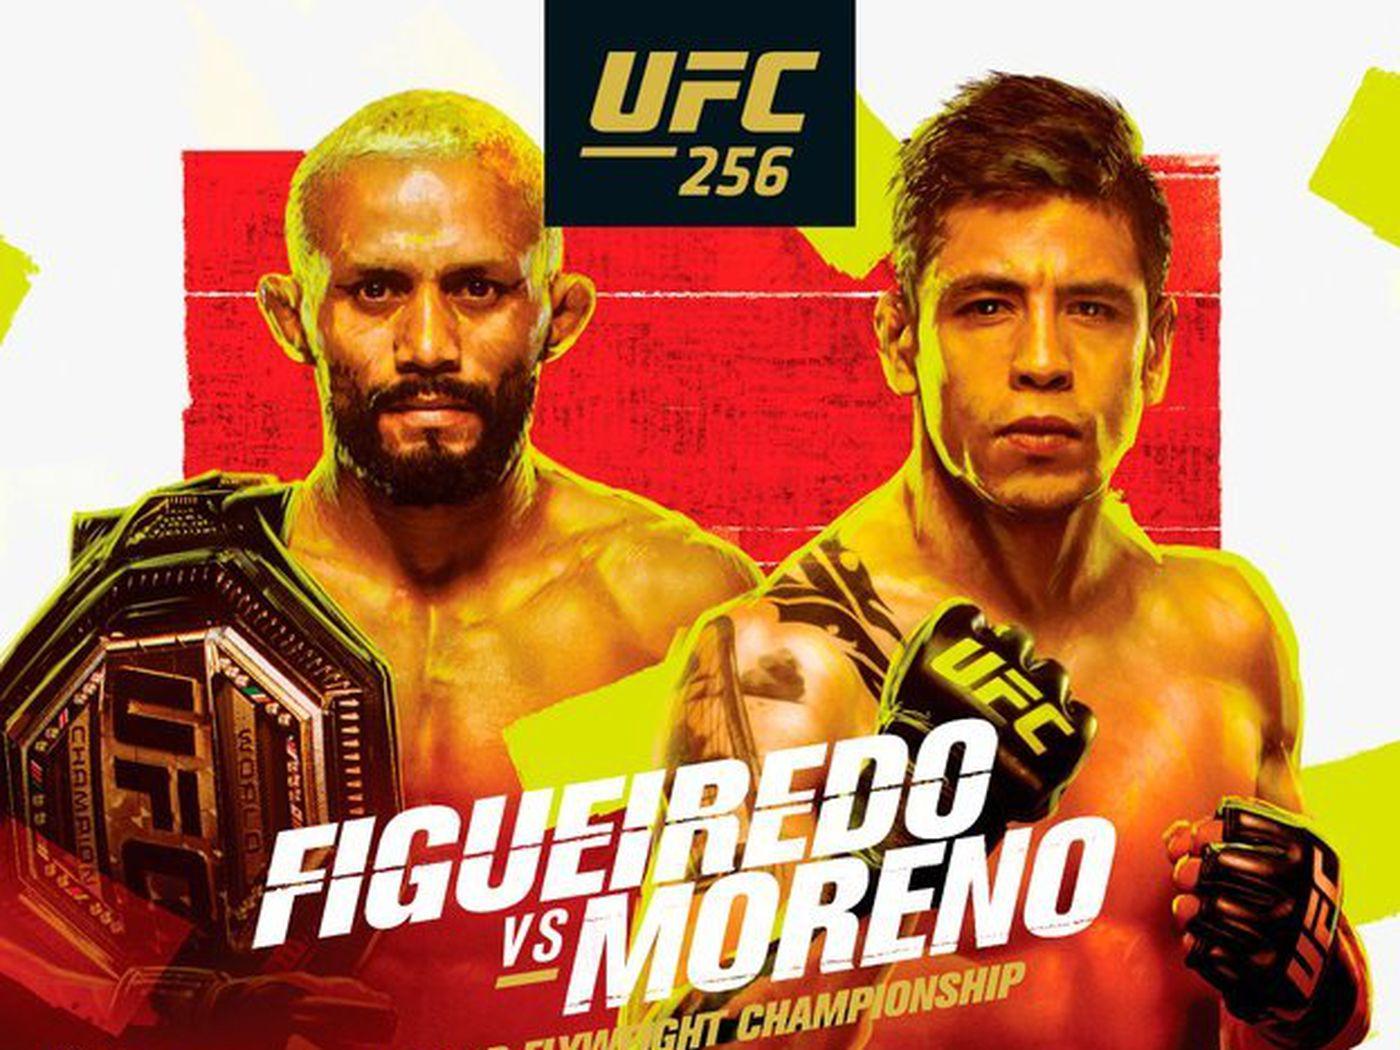 UFC 256: Figueiredo vs. Moreno - Figueiredo